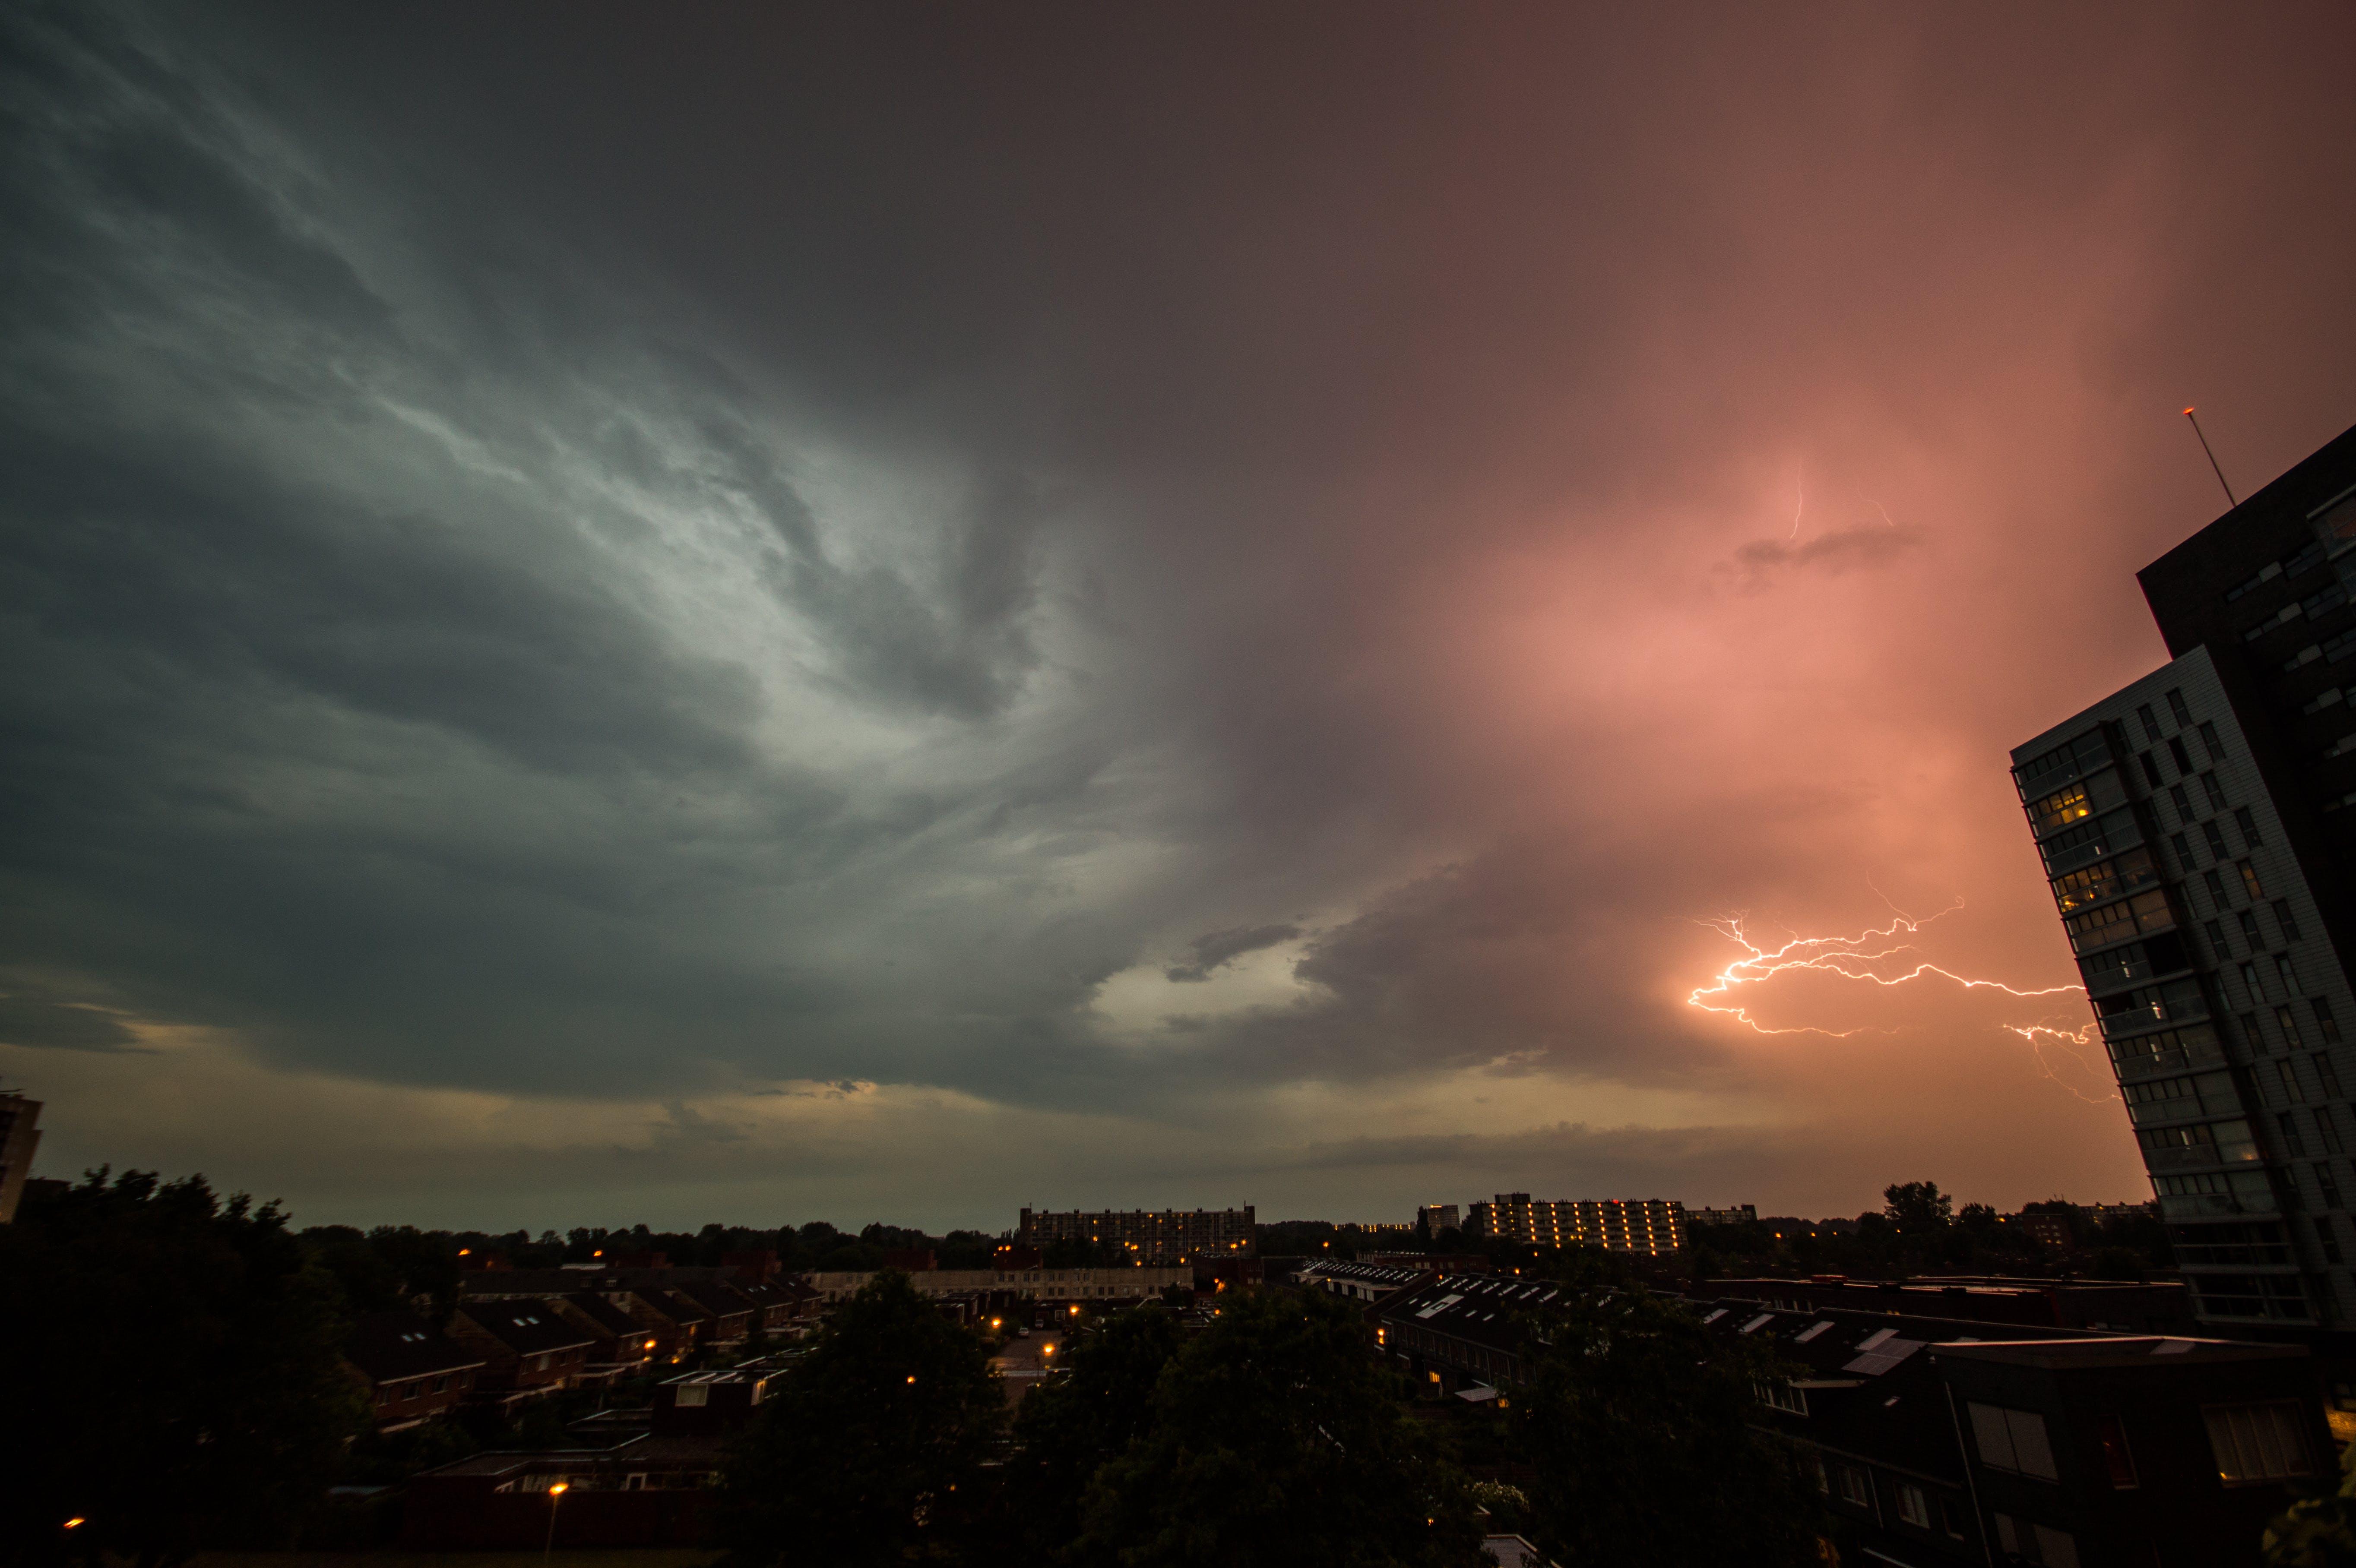 Free stock photo of city, sky, weather, groningen